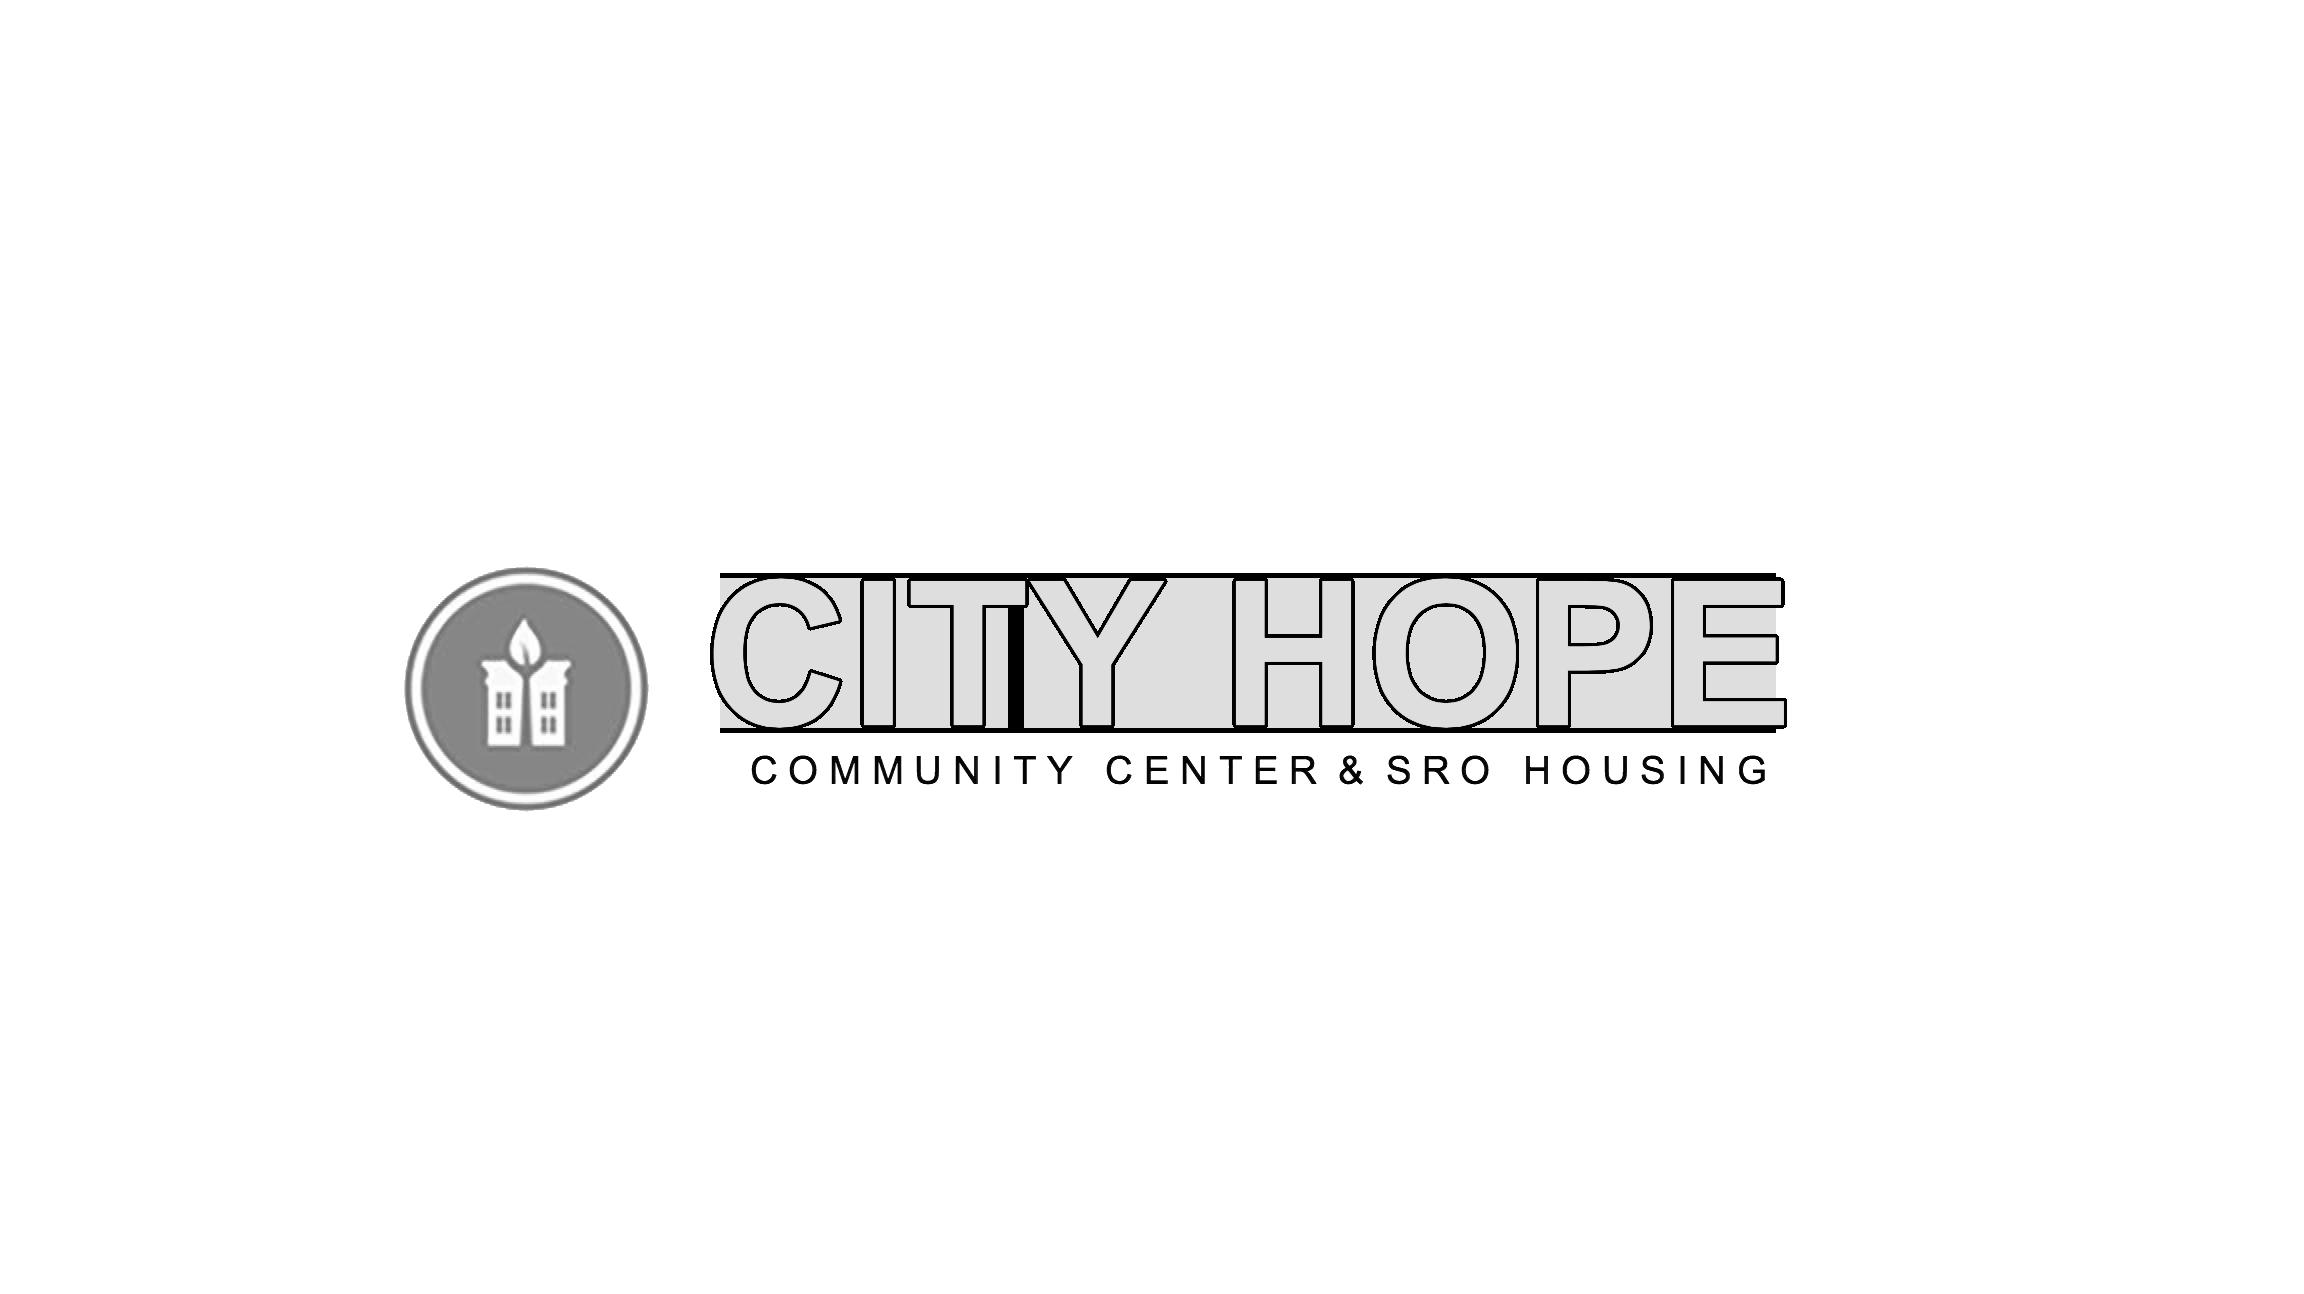 CIty Hope - Community Center & SRO Housing Business Strategy.More..